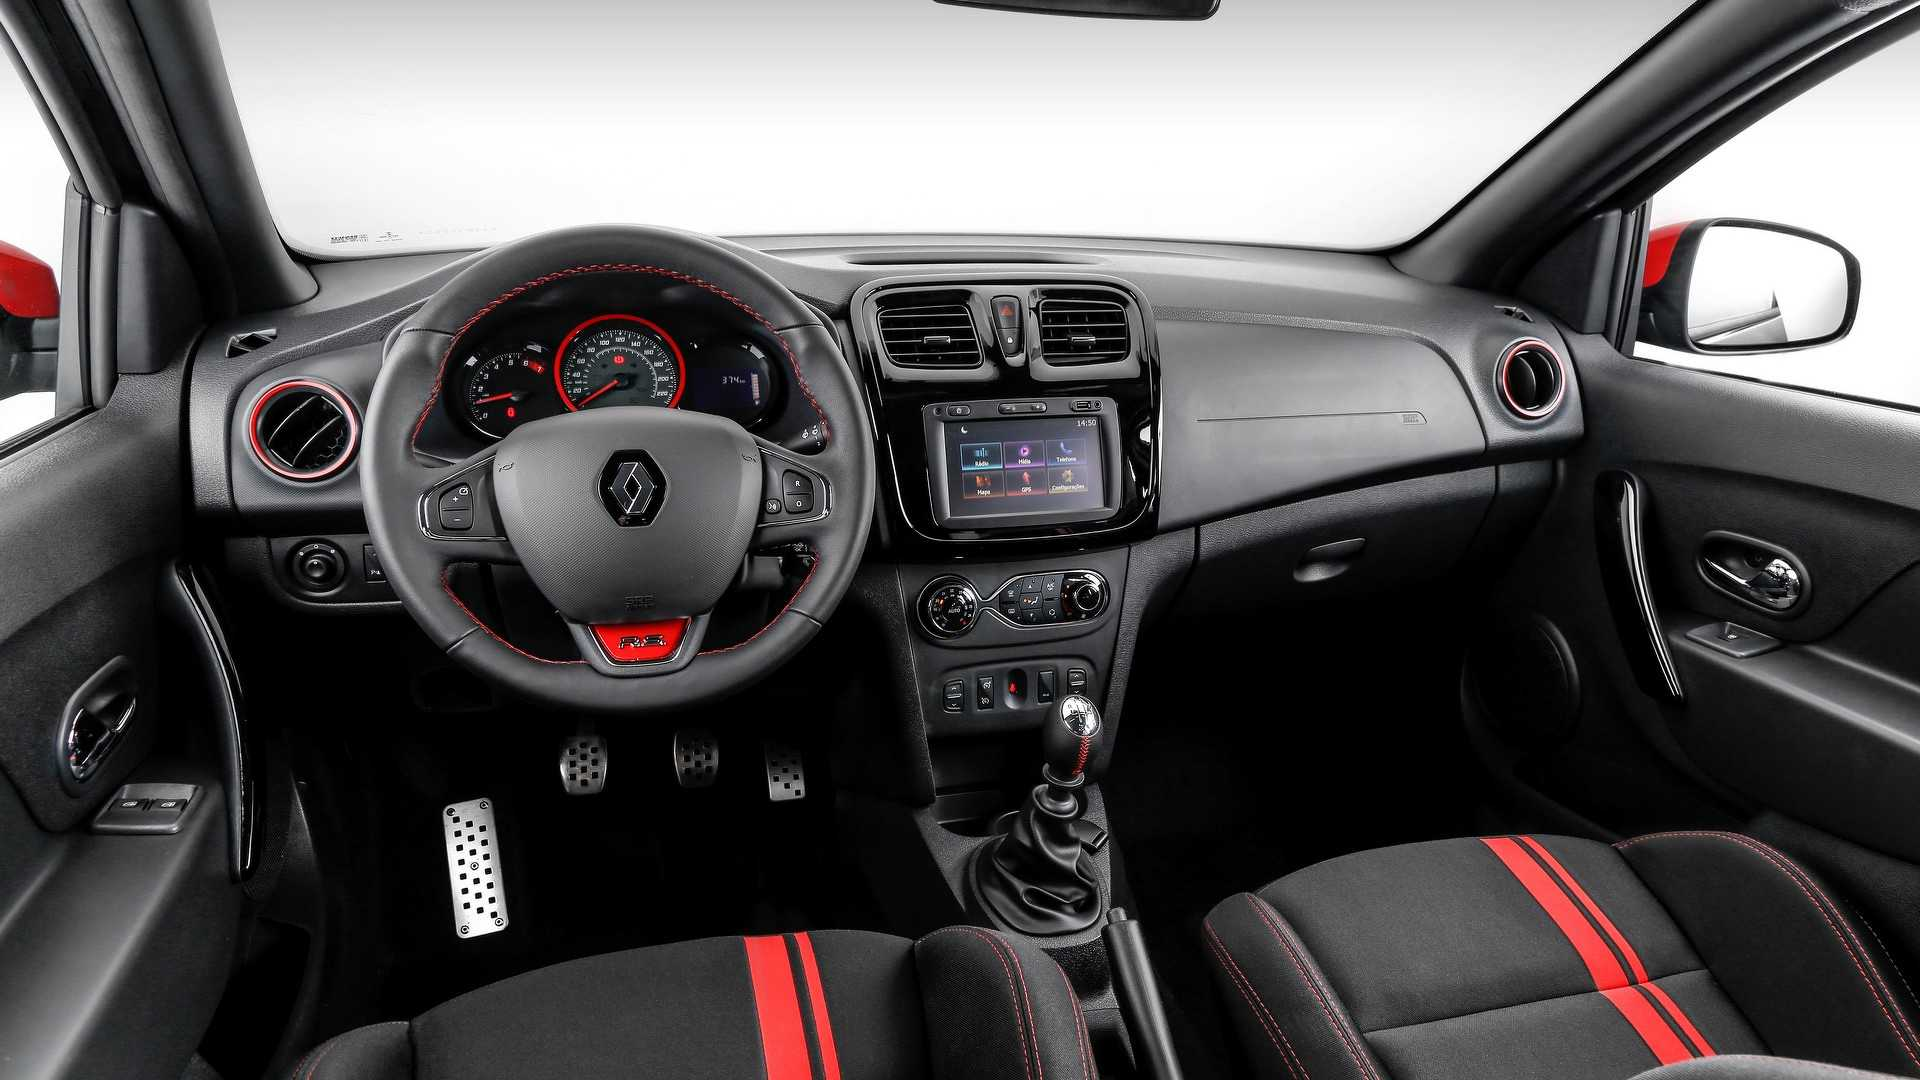 2017 renault sandero rs interior - Dacia duster 2017 interior ...